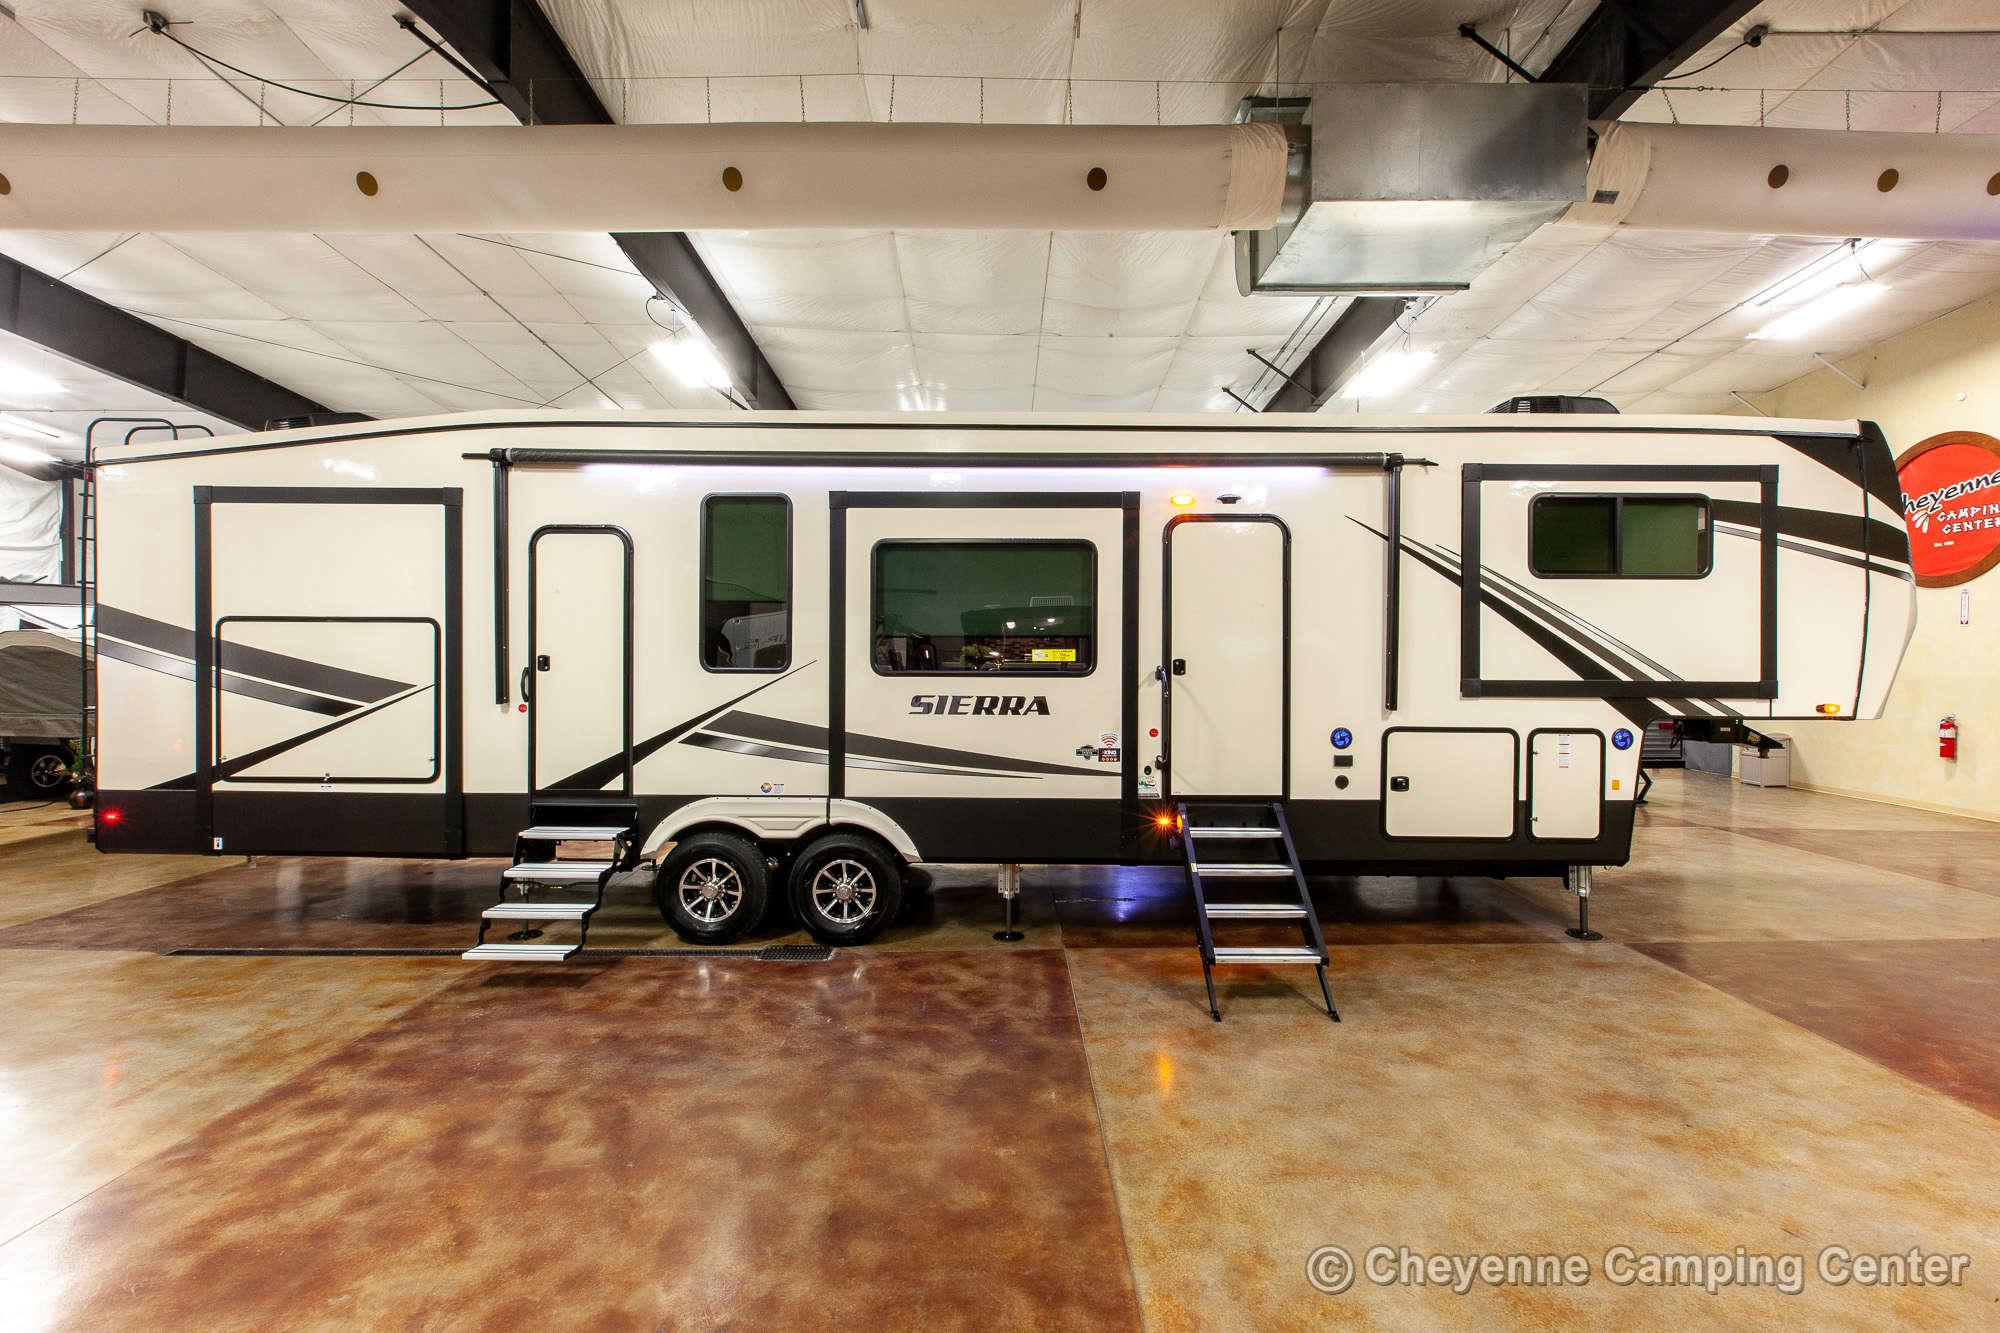 2021 Forest River Sierra 379FLOK Fifth Wheel Exterior Image